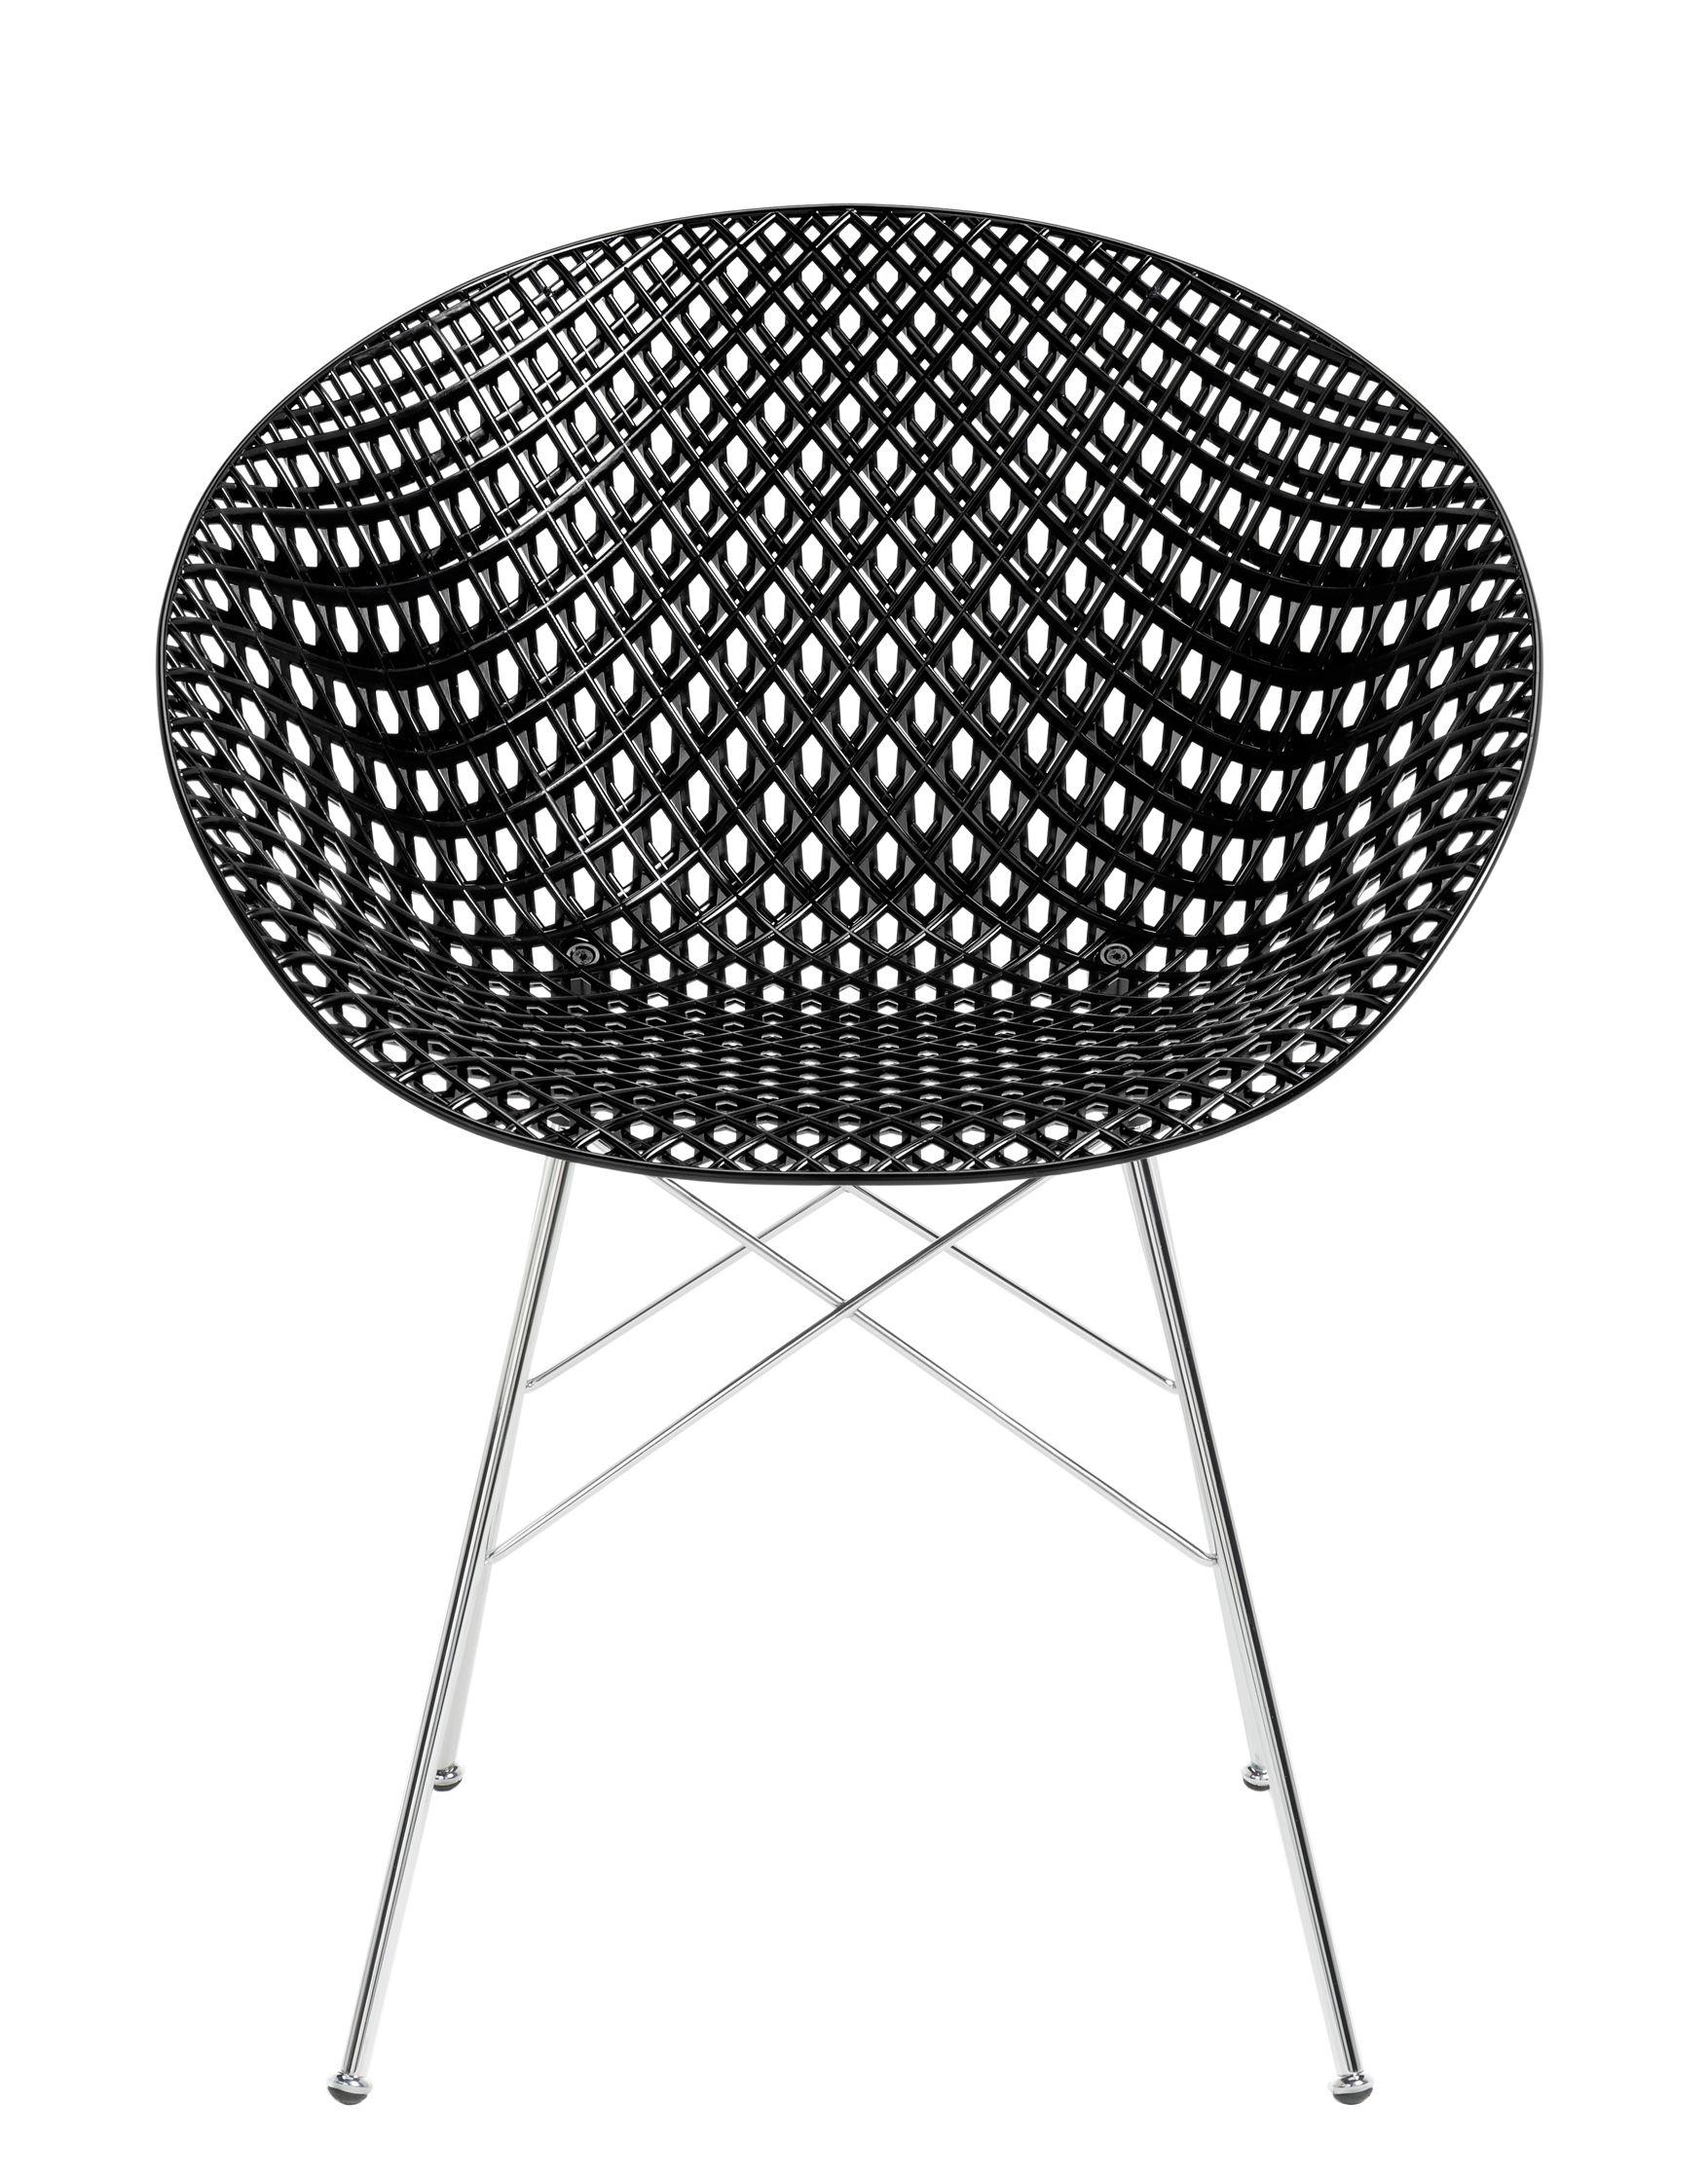 Furniture - Chairs - Smatrik Armchair - / Plastic seat & metal legs by Kartell - Black / Chrome - Chromed steel, Polycarbonate